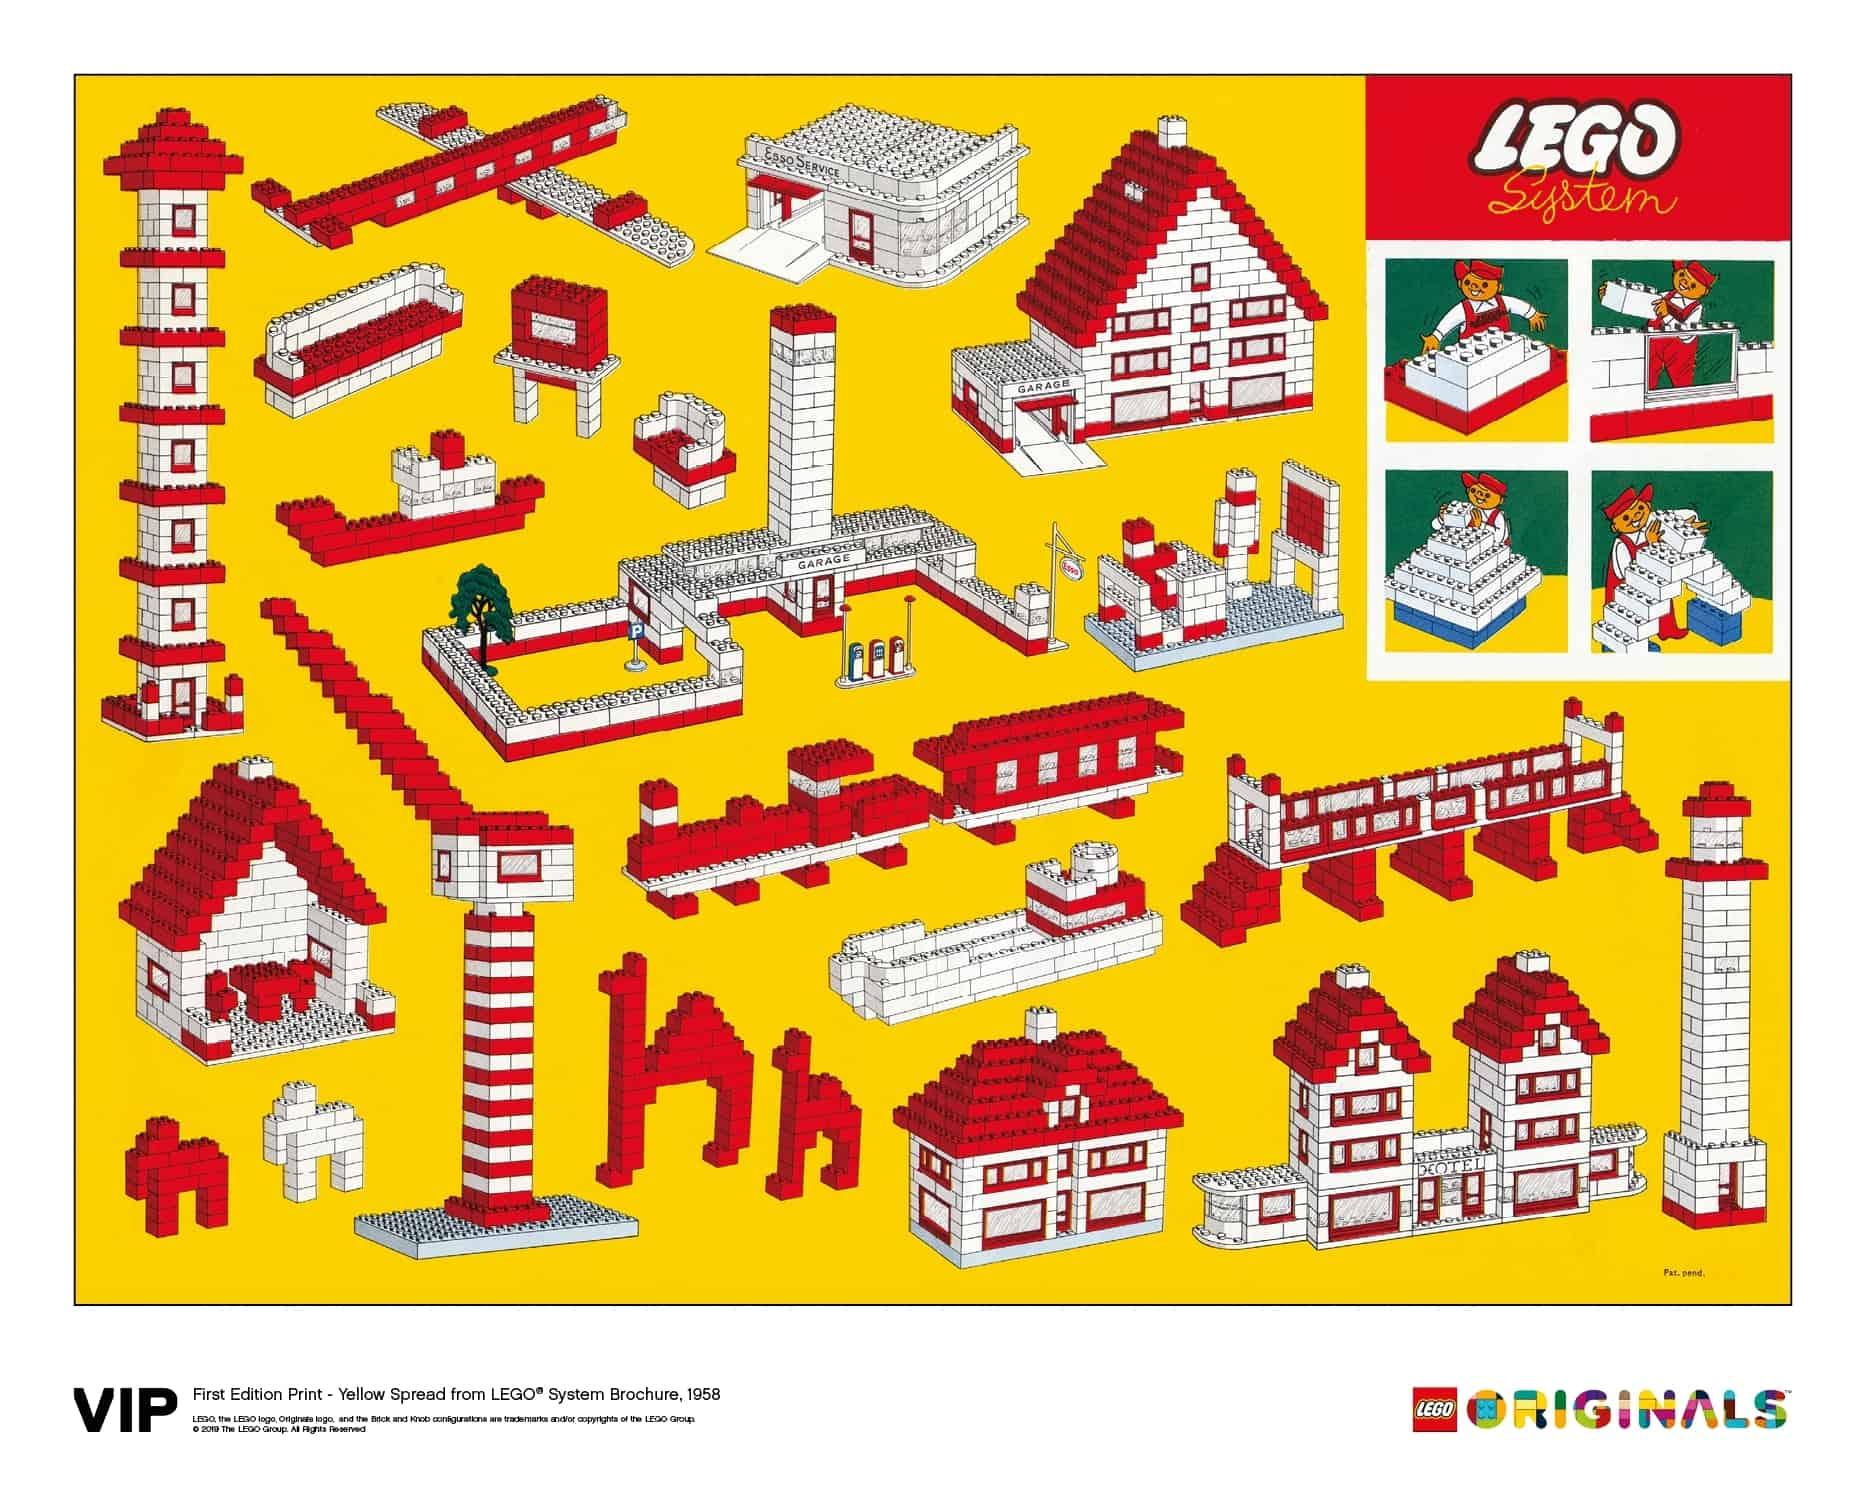 yellow spread lego system brochure 1958 5006005